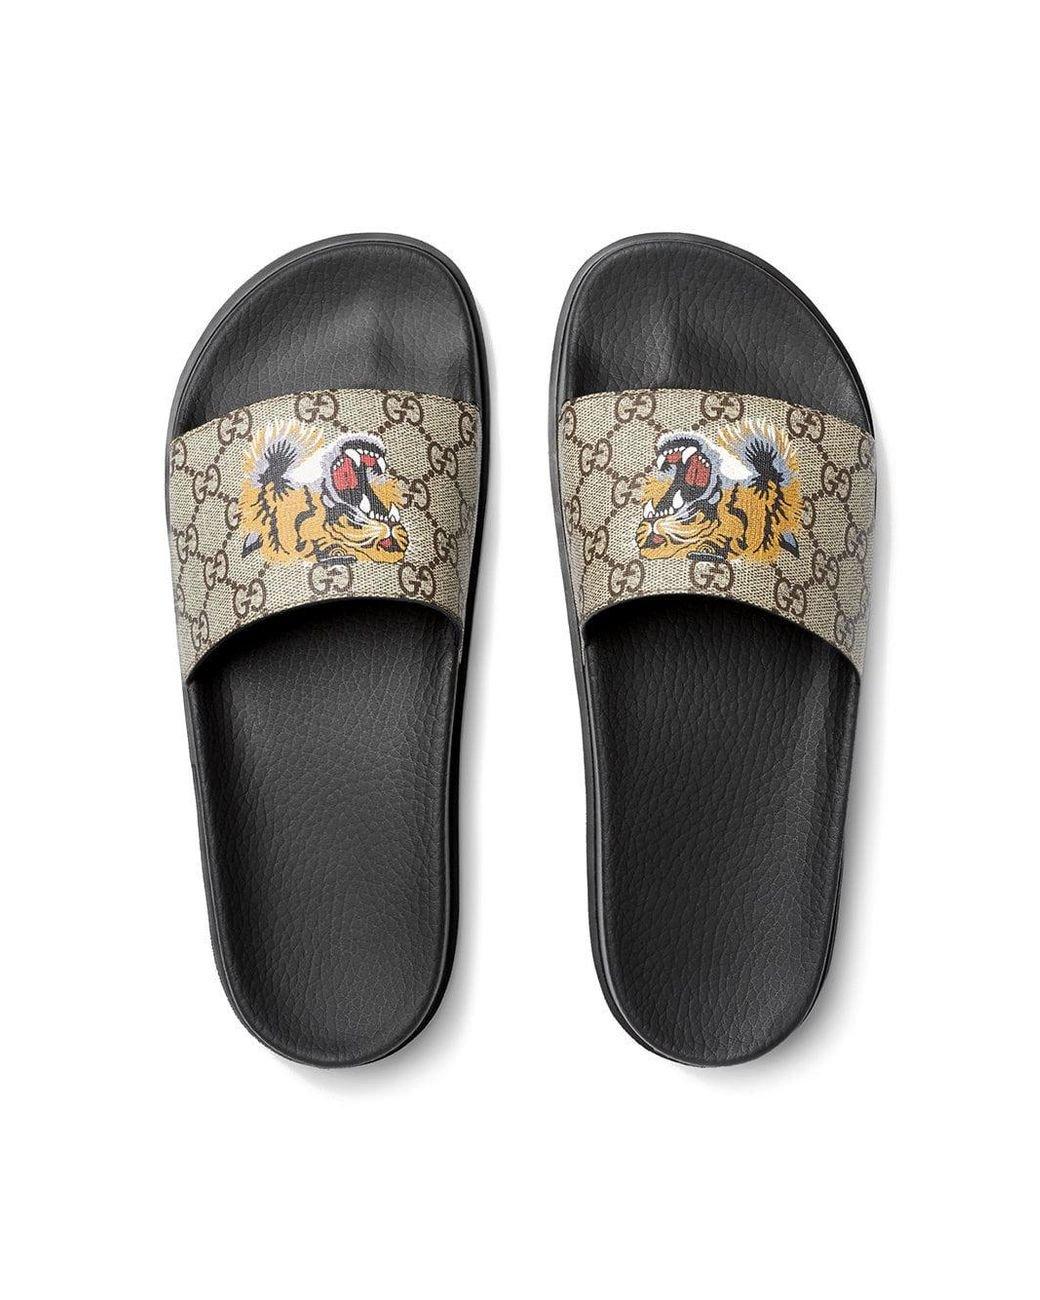 1c41ddcb75a Lyst - Gucci GG Supreme Tiger Slide Sandal in Brown for Men - Save 18%